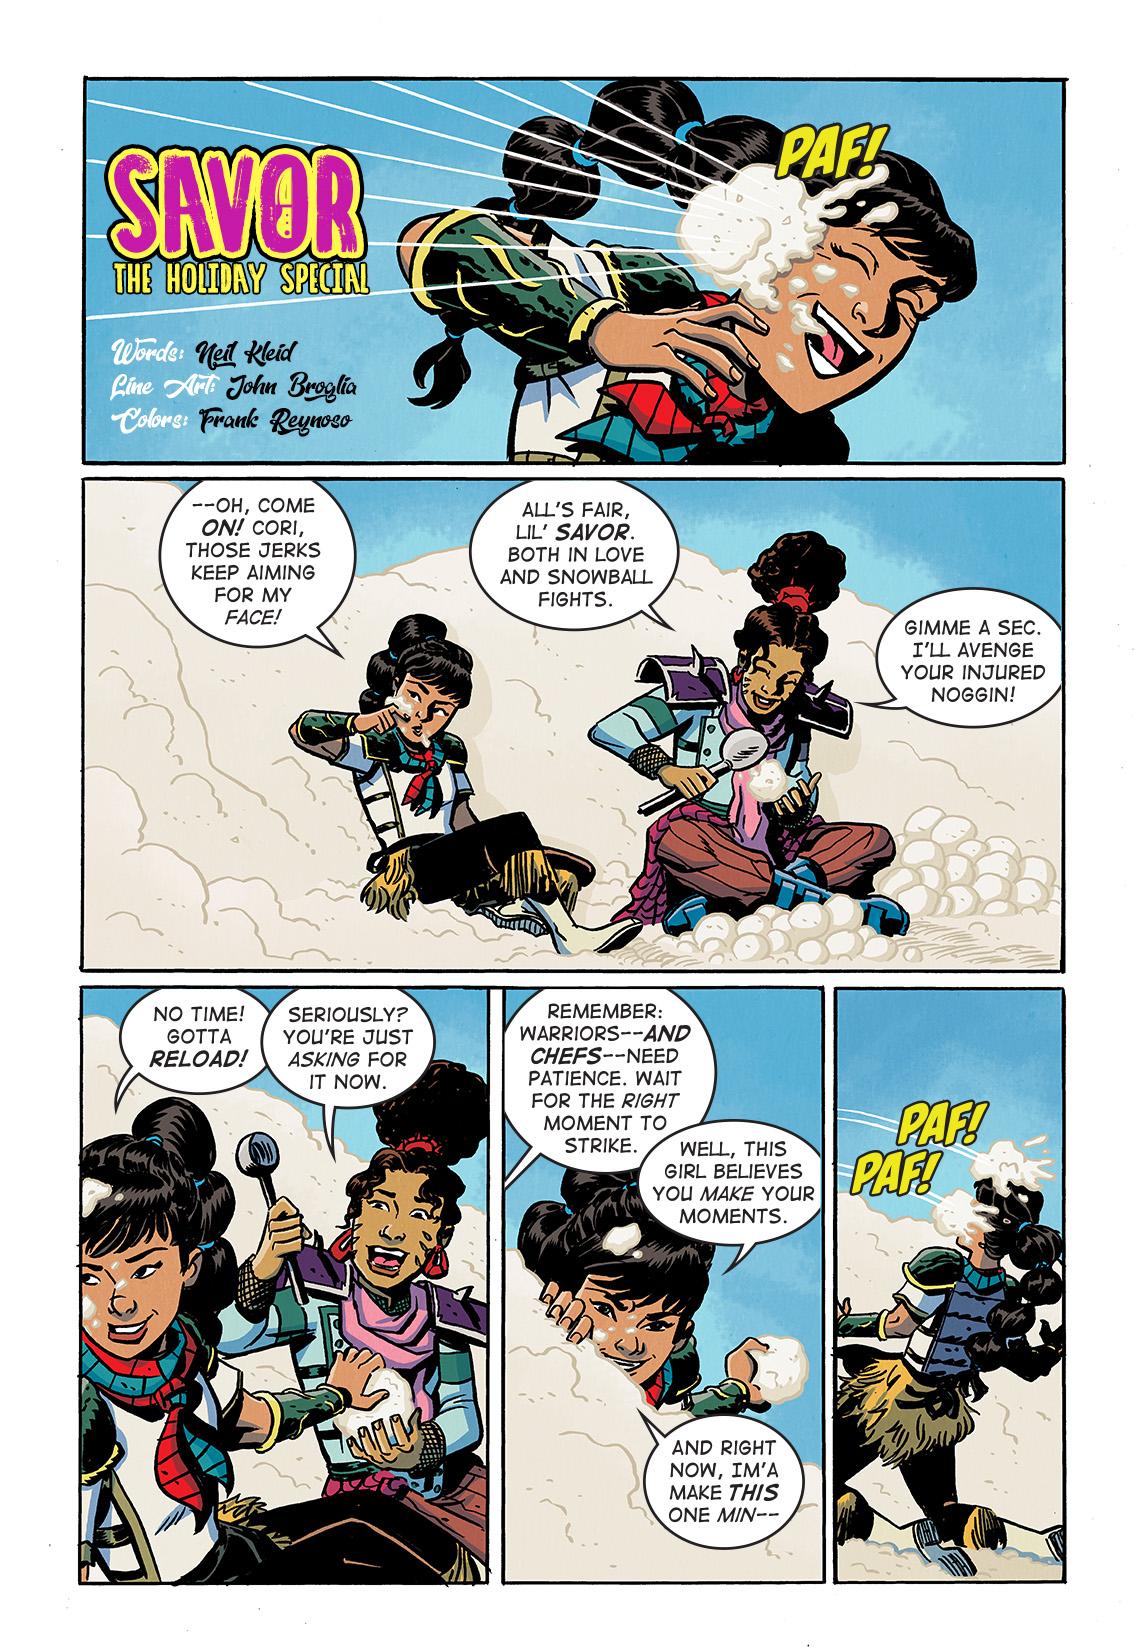 SavorHoliday_Digital_Comic_Color_PG01_Large First Look at Dark Horse Comics' SAVOR TP